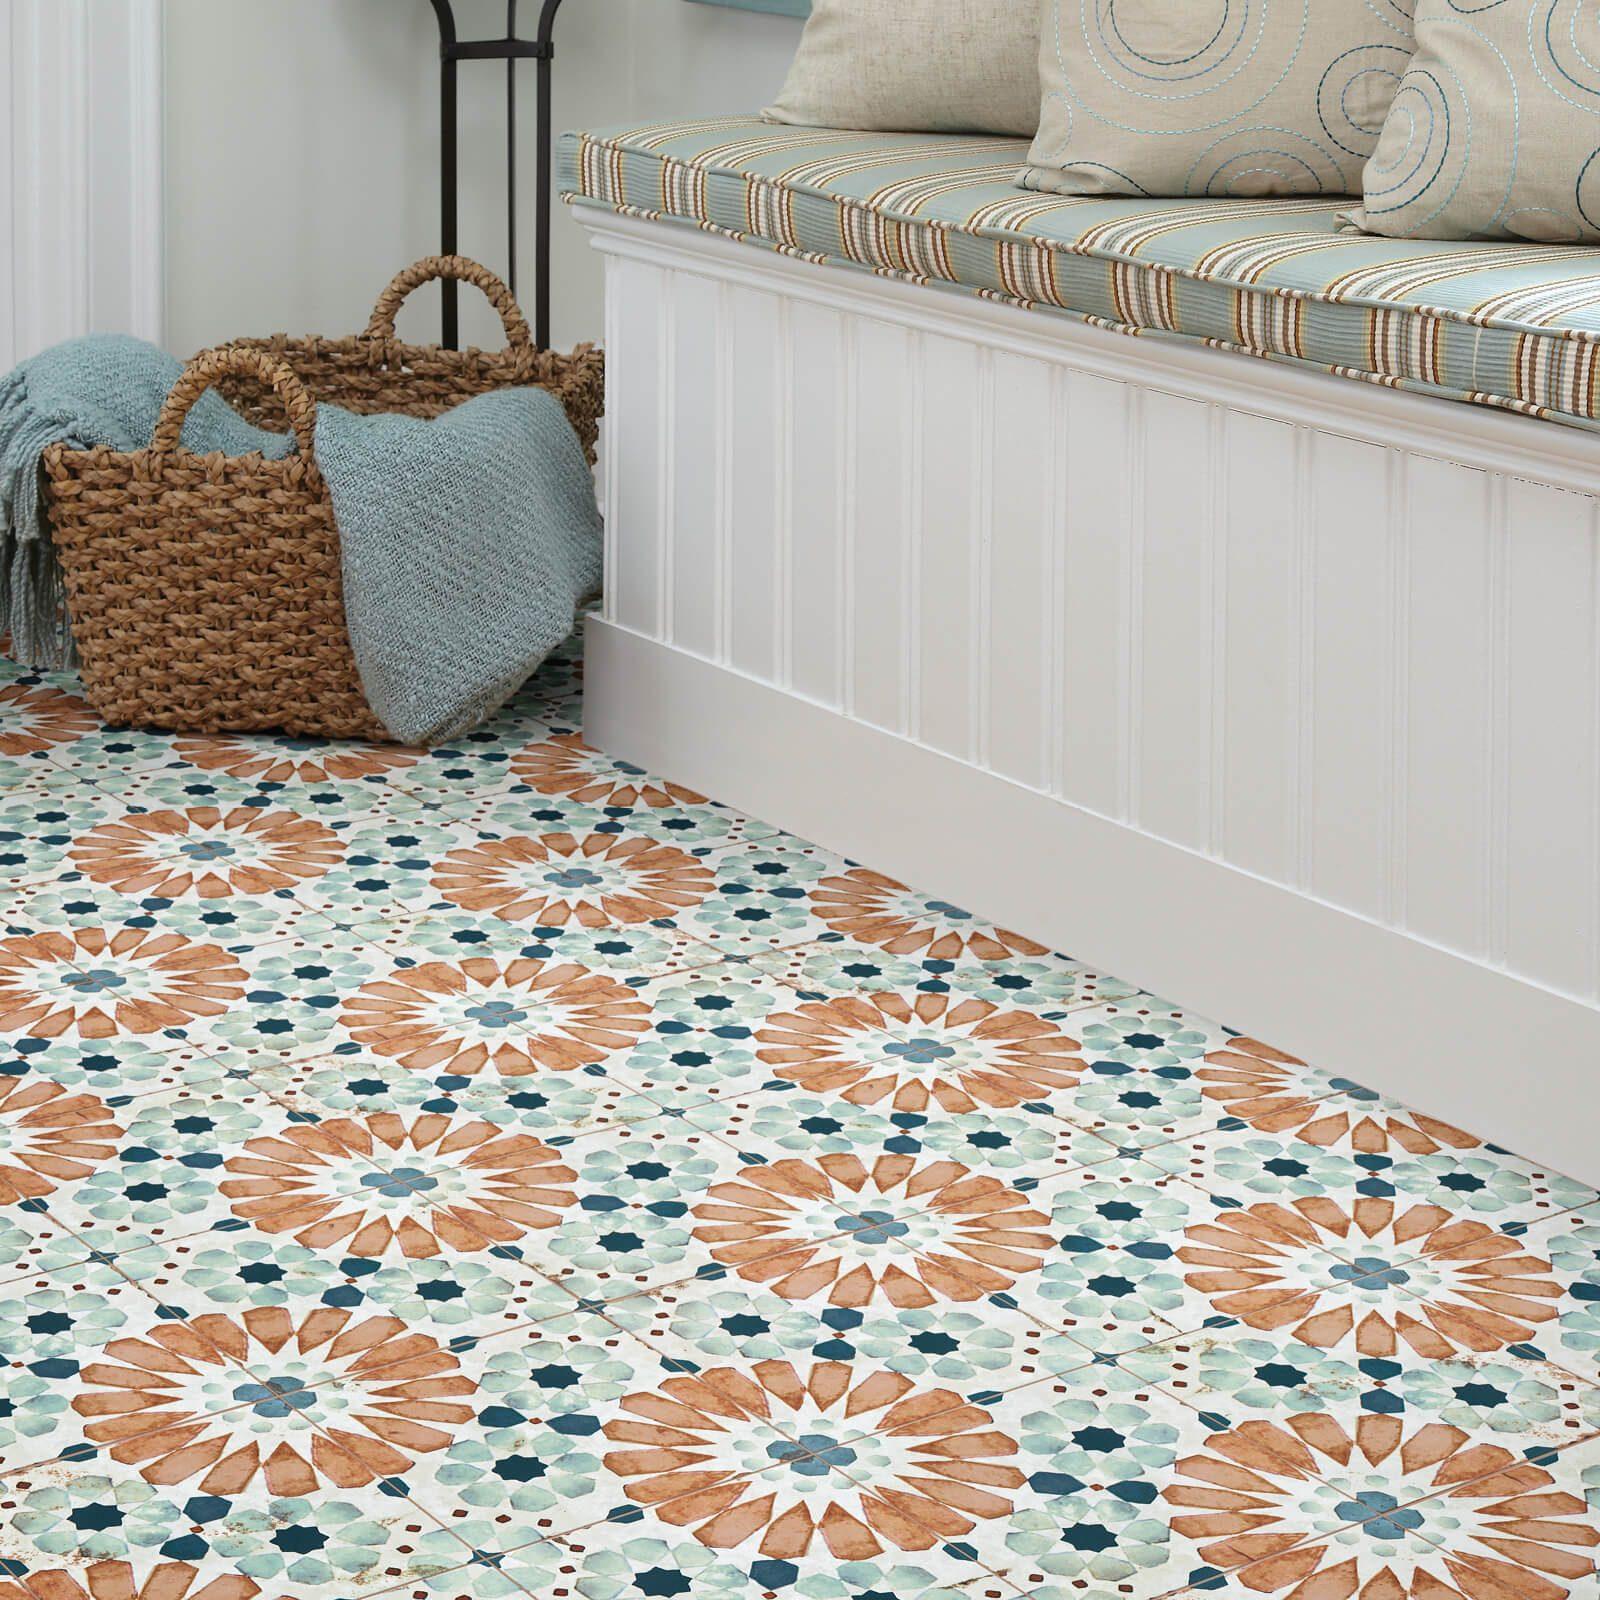 Islander Tiles | Bram Flooring